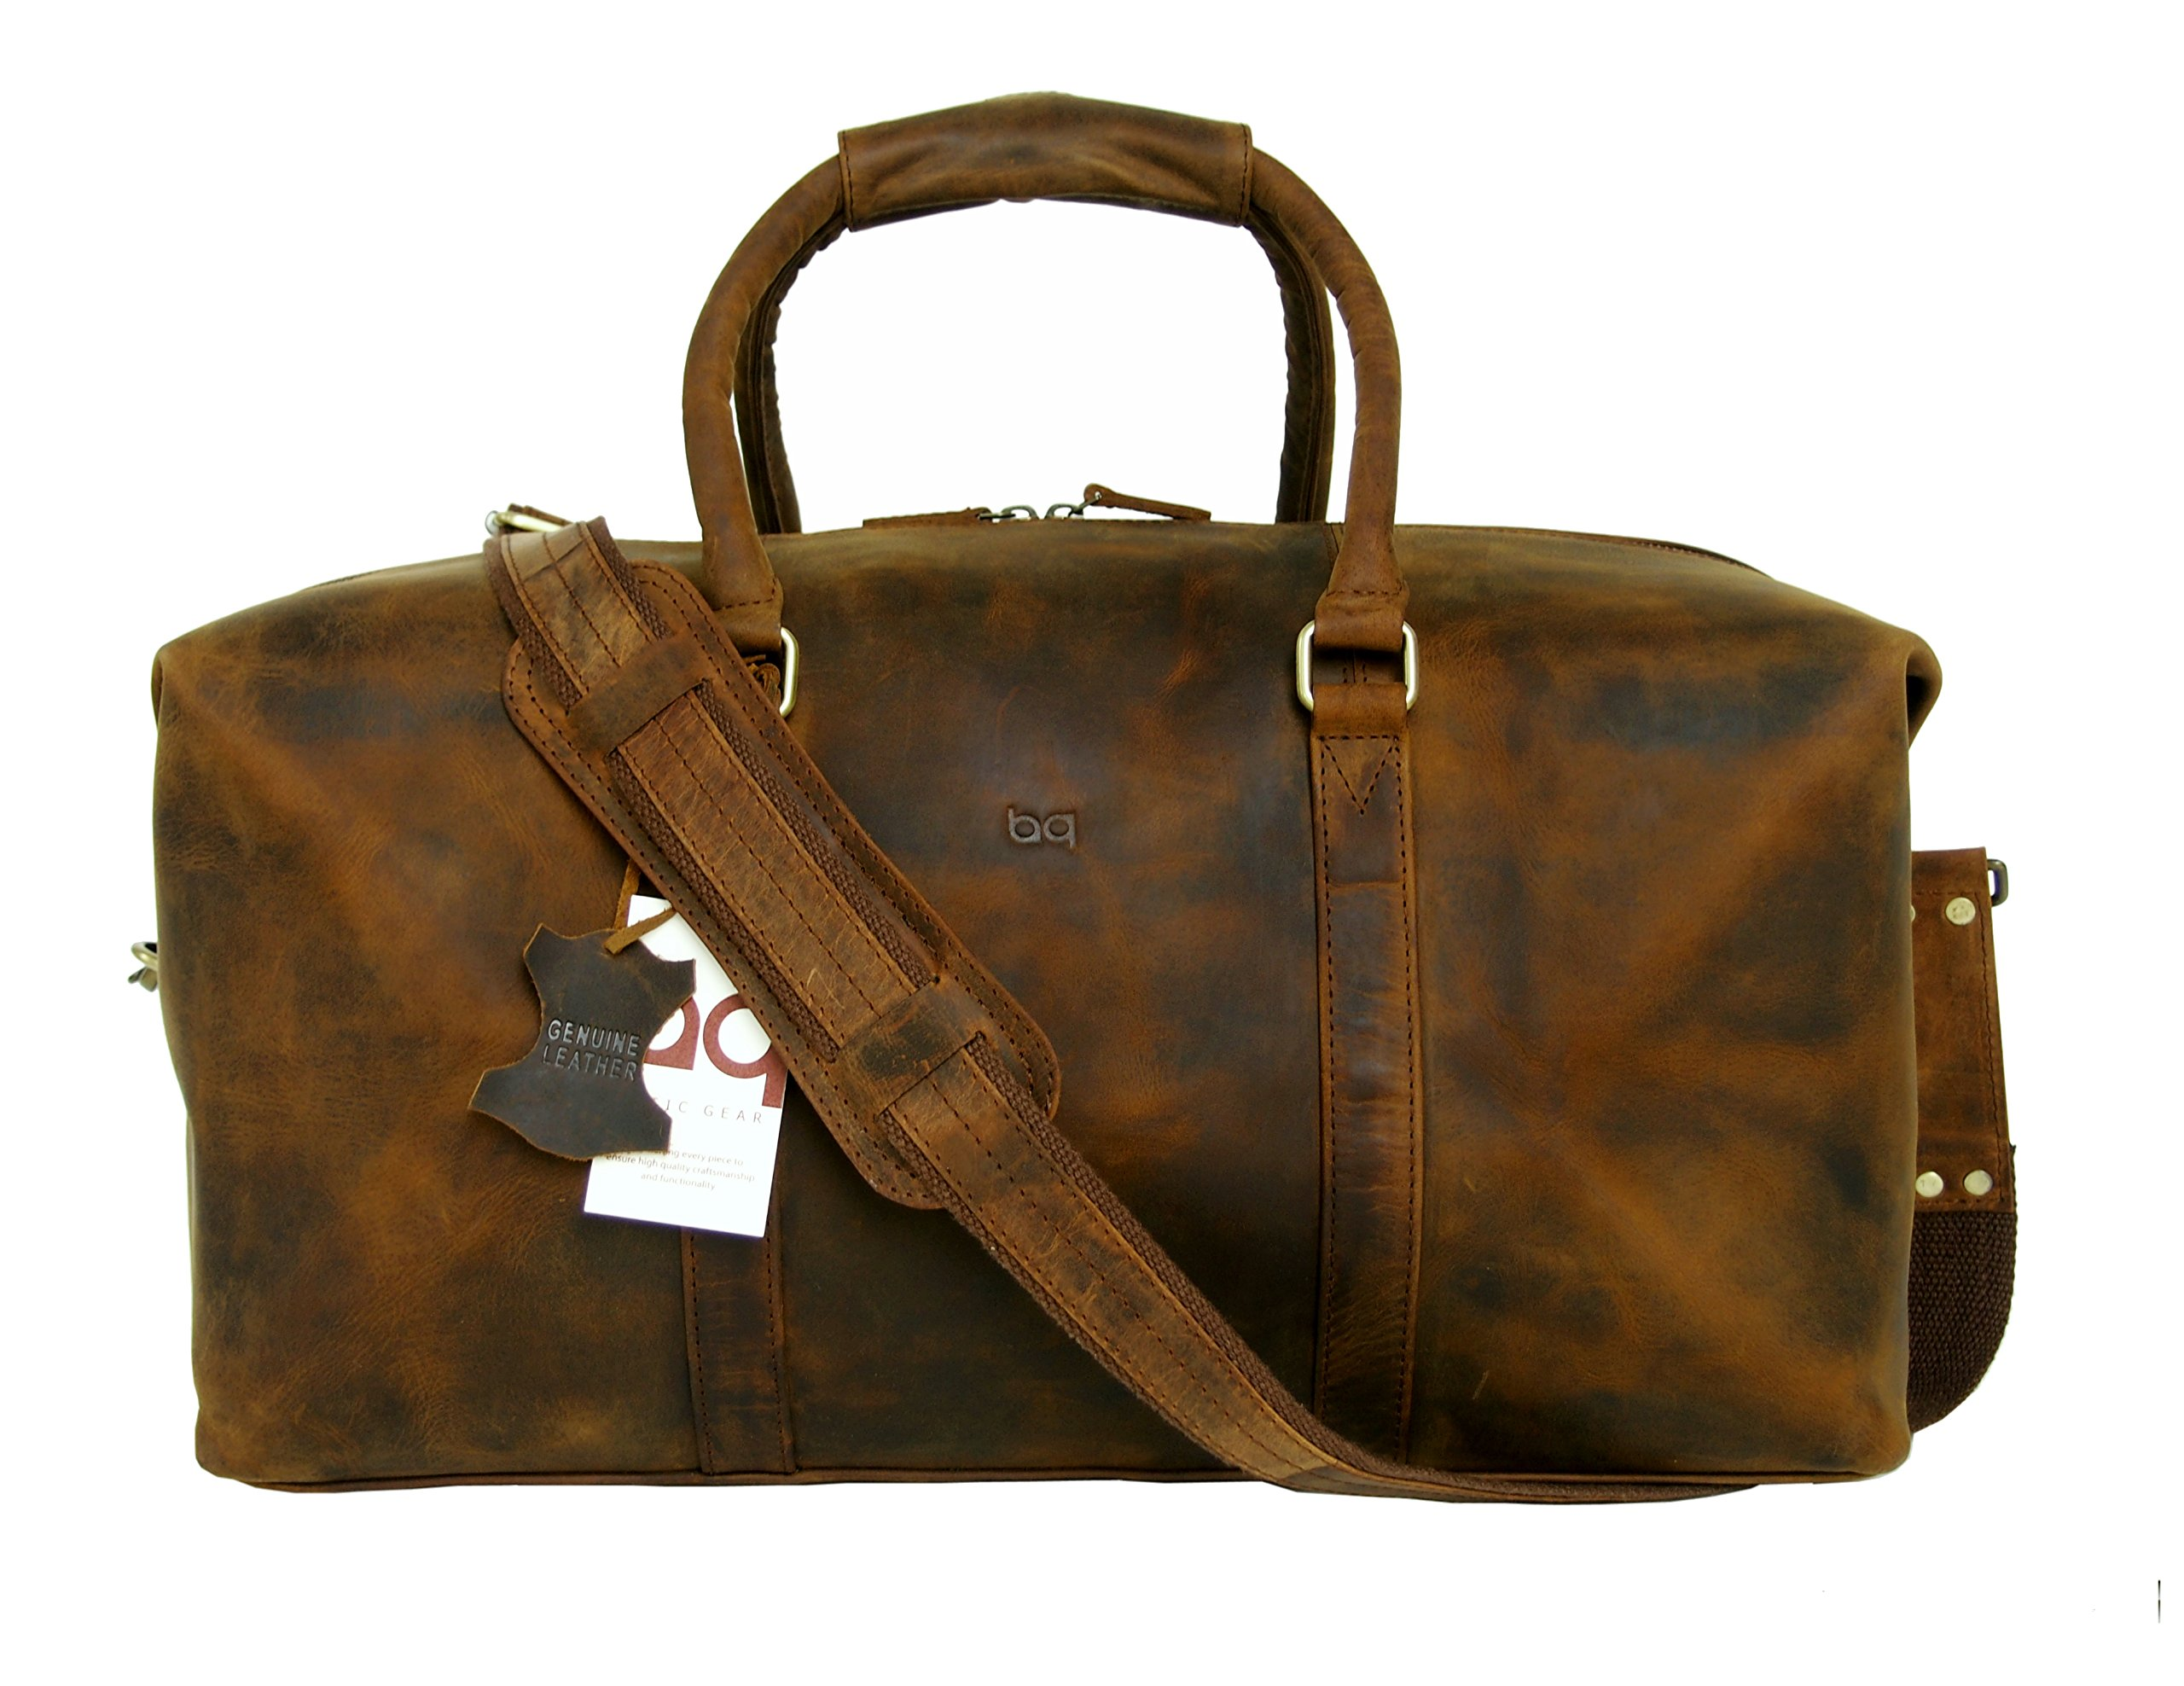 Basic Gear Full Grain Leather Duffle Bag